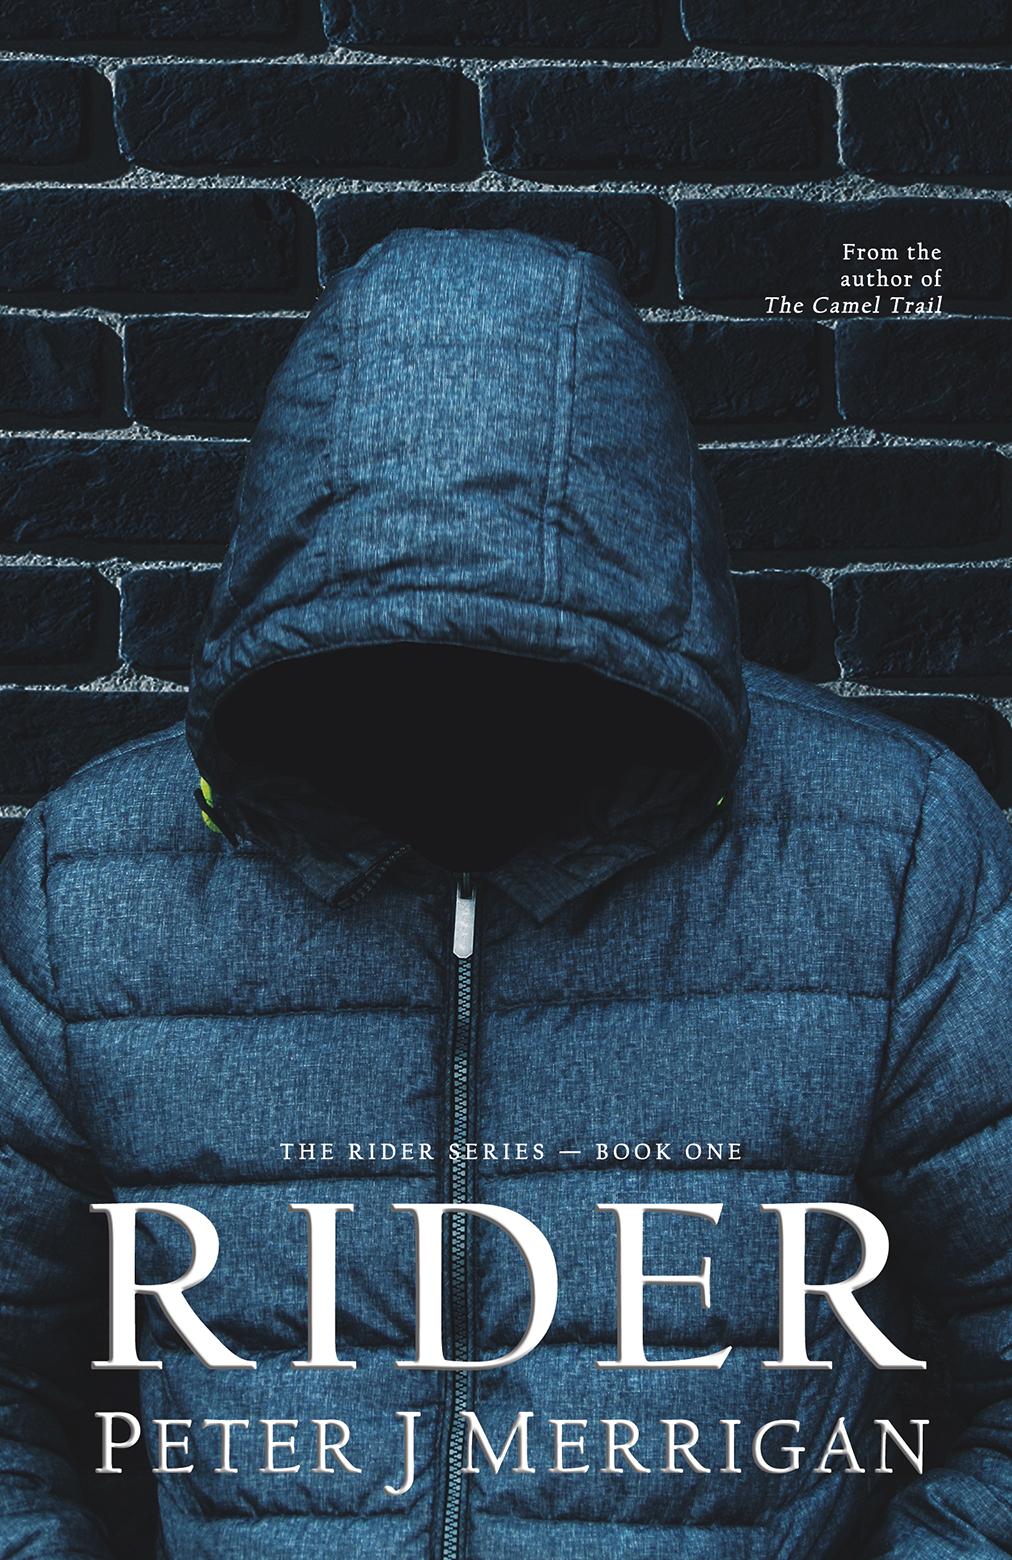 Rider reprint 2017 front.jpg